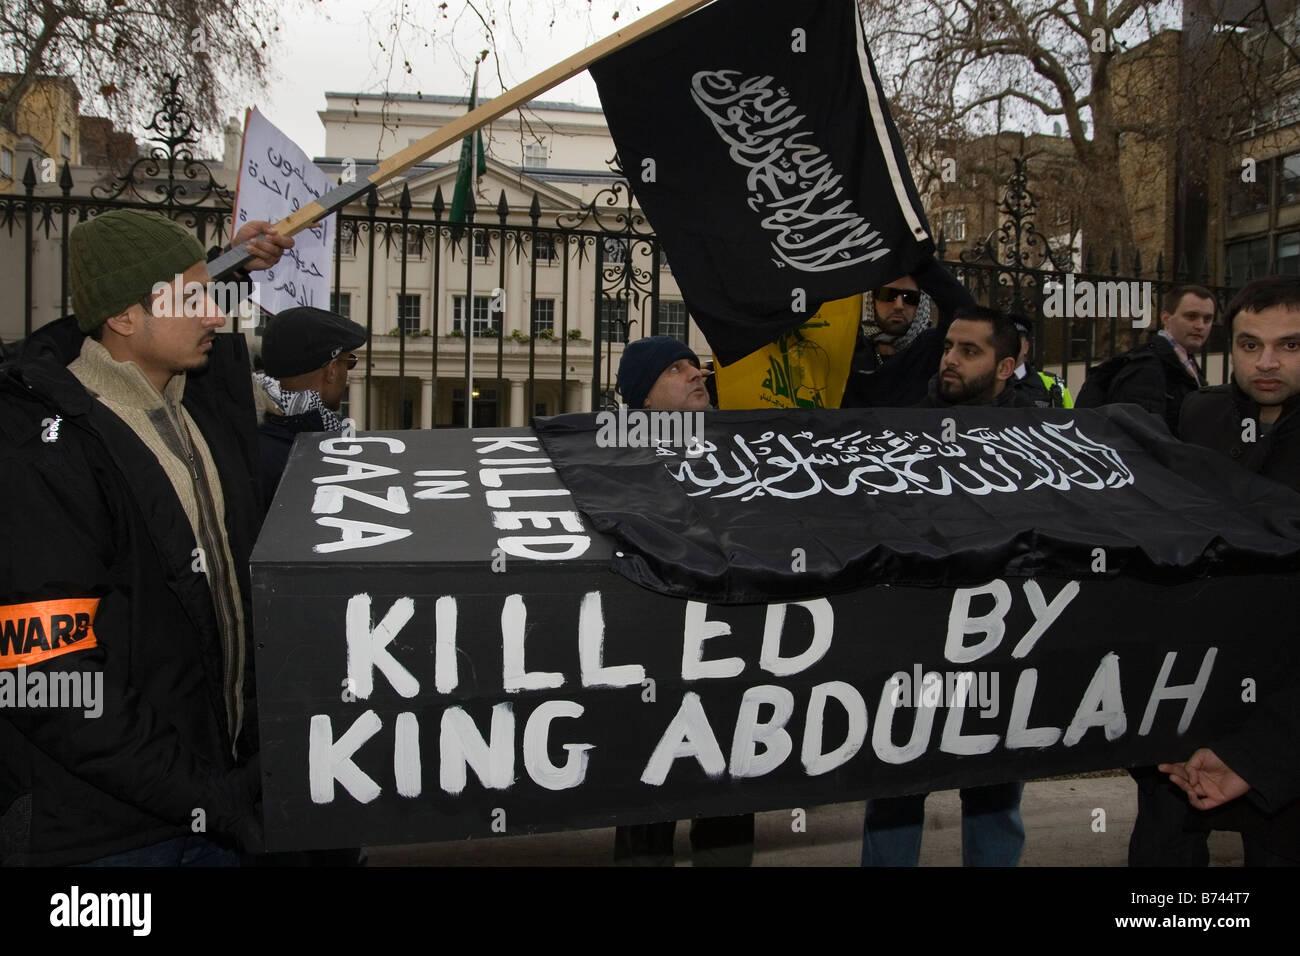 demonstration outside Saudi Arabian embassy - Stock Image